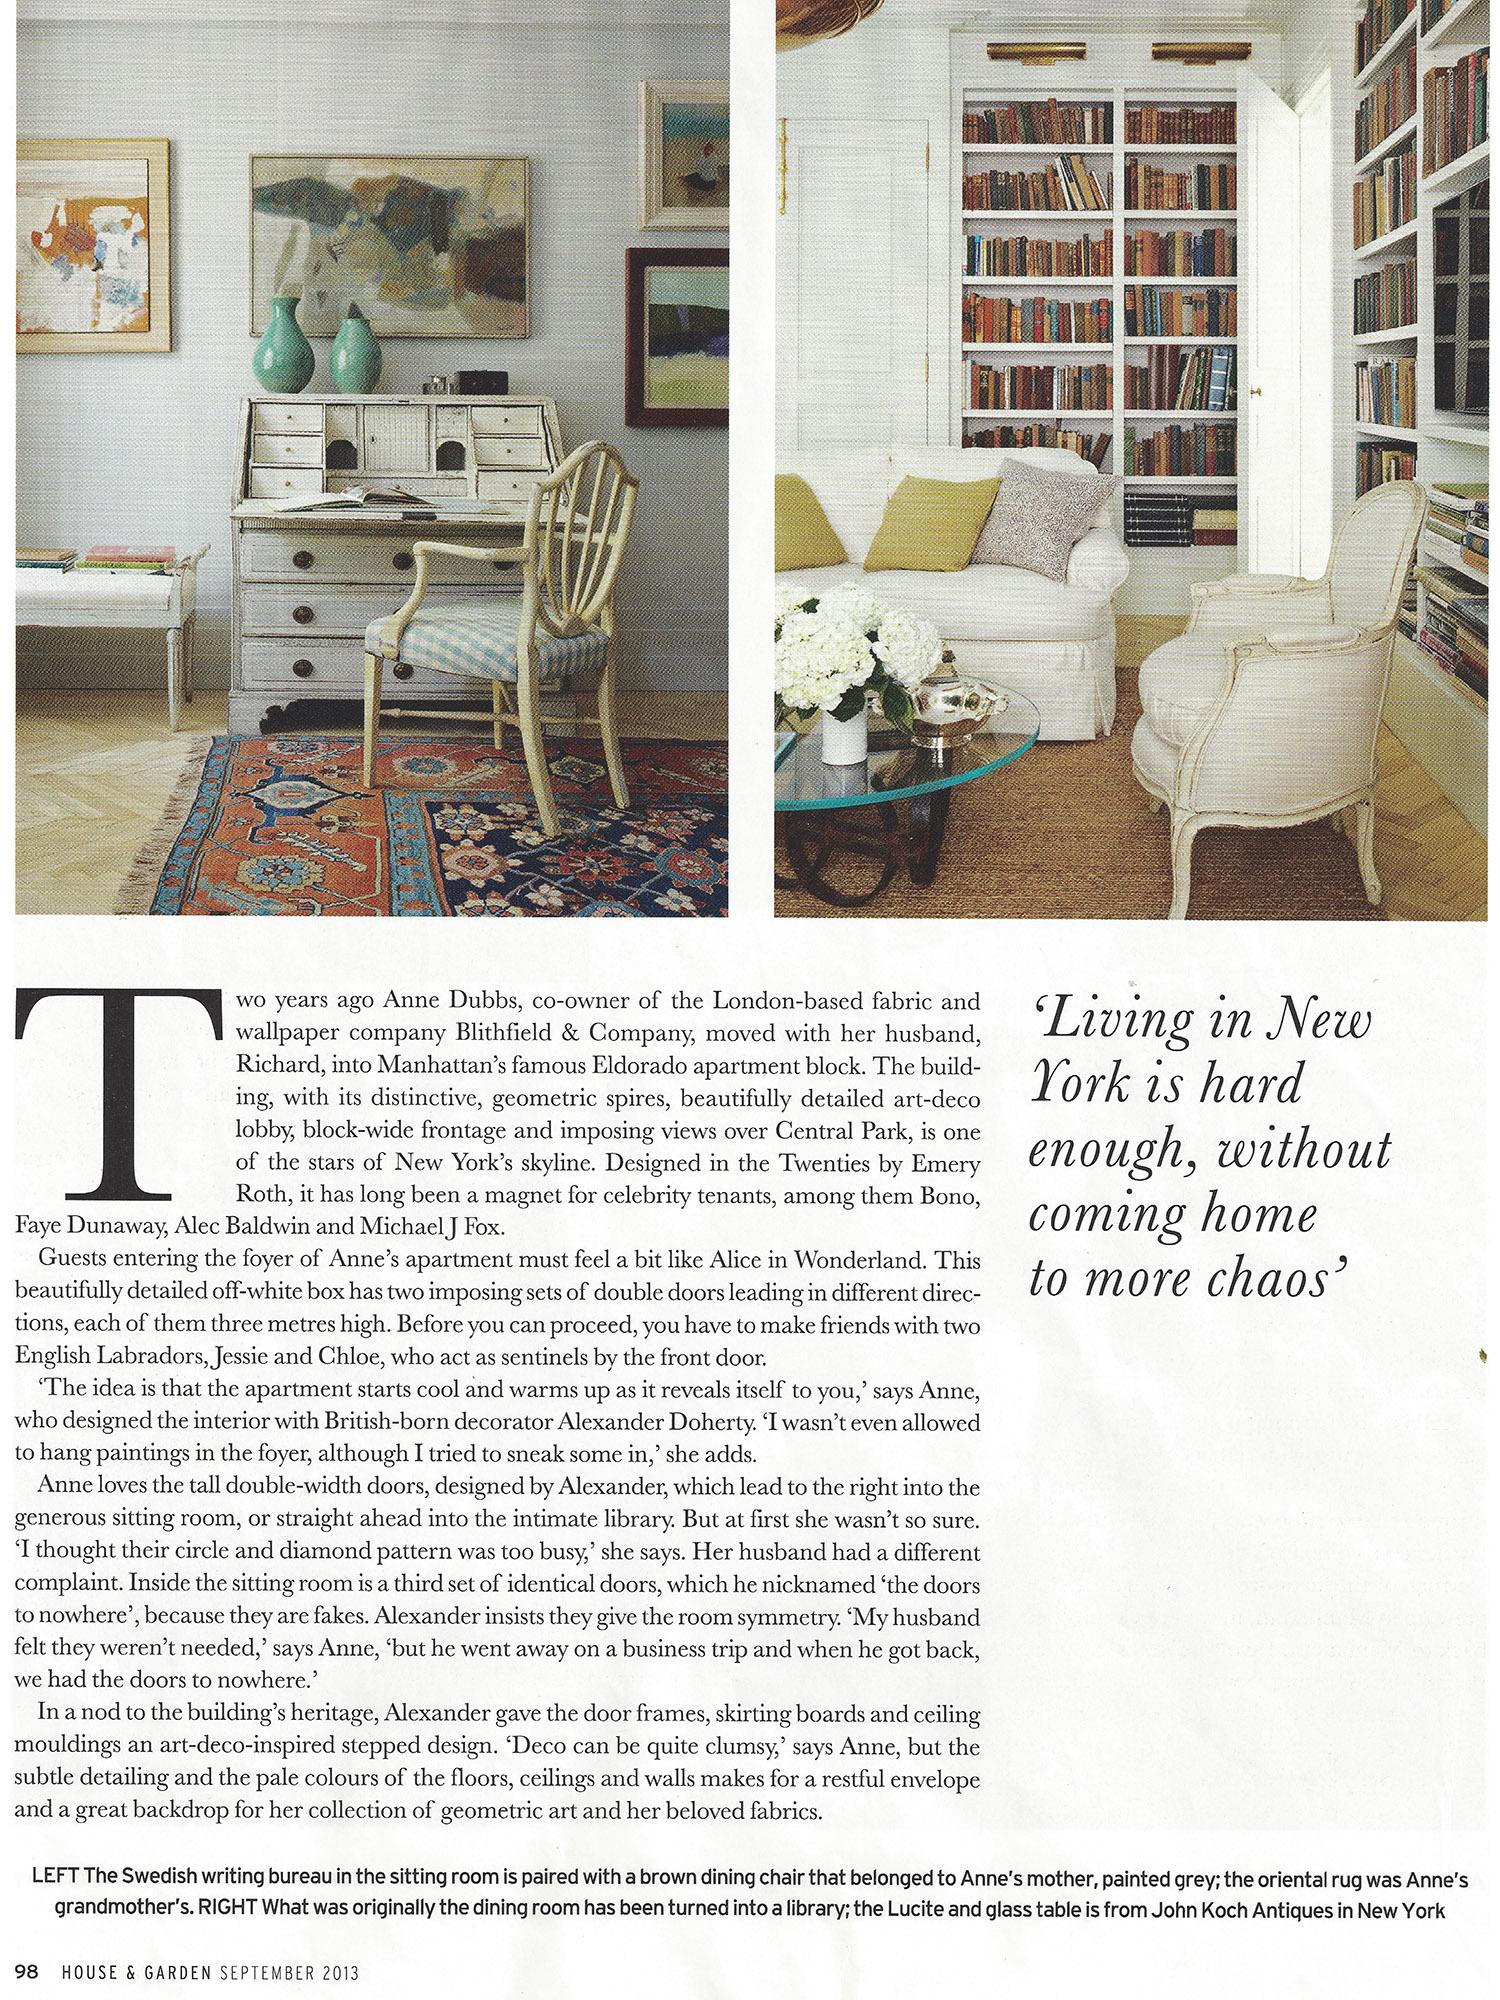 2013 September-House & Garden Page 3 of 4.jpeg